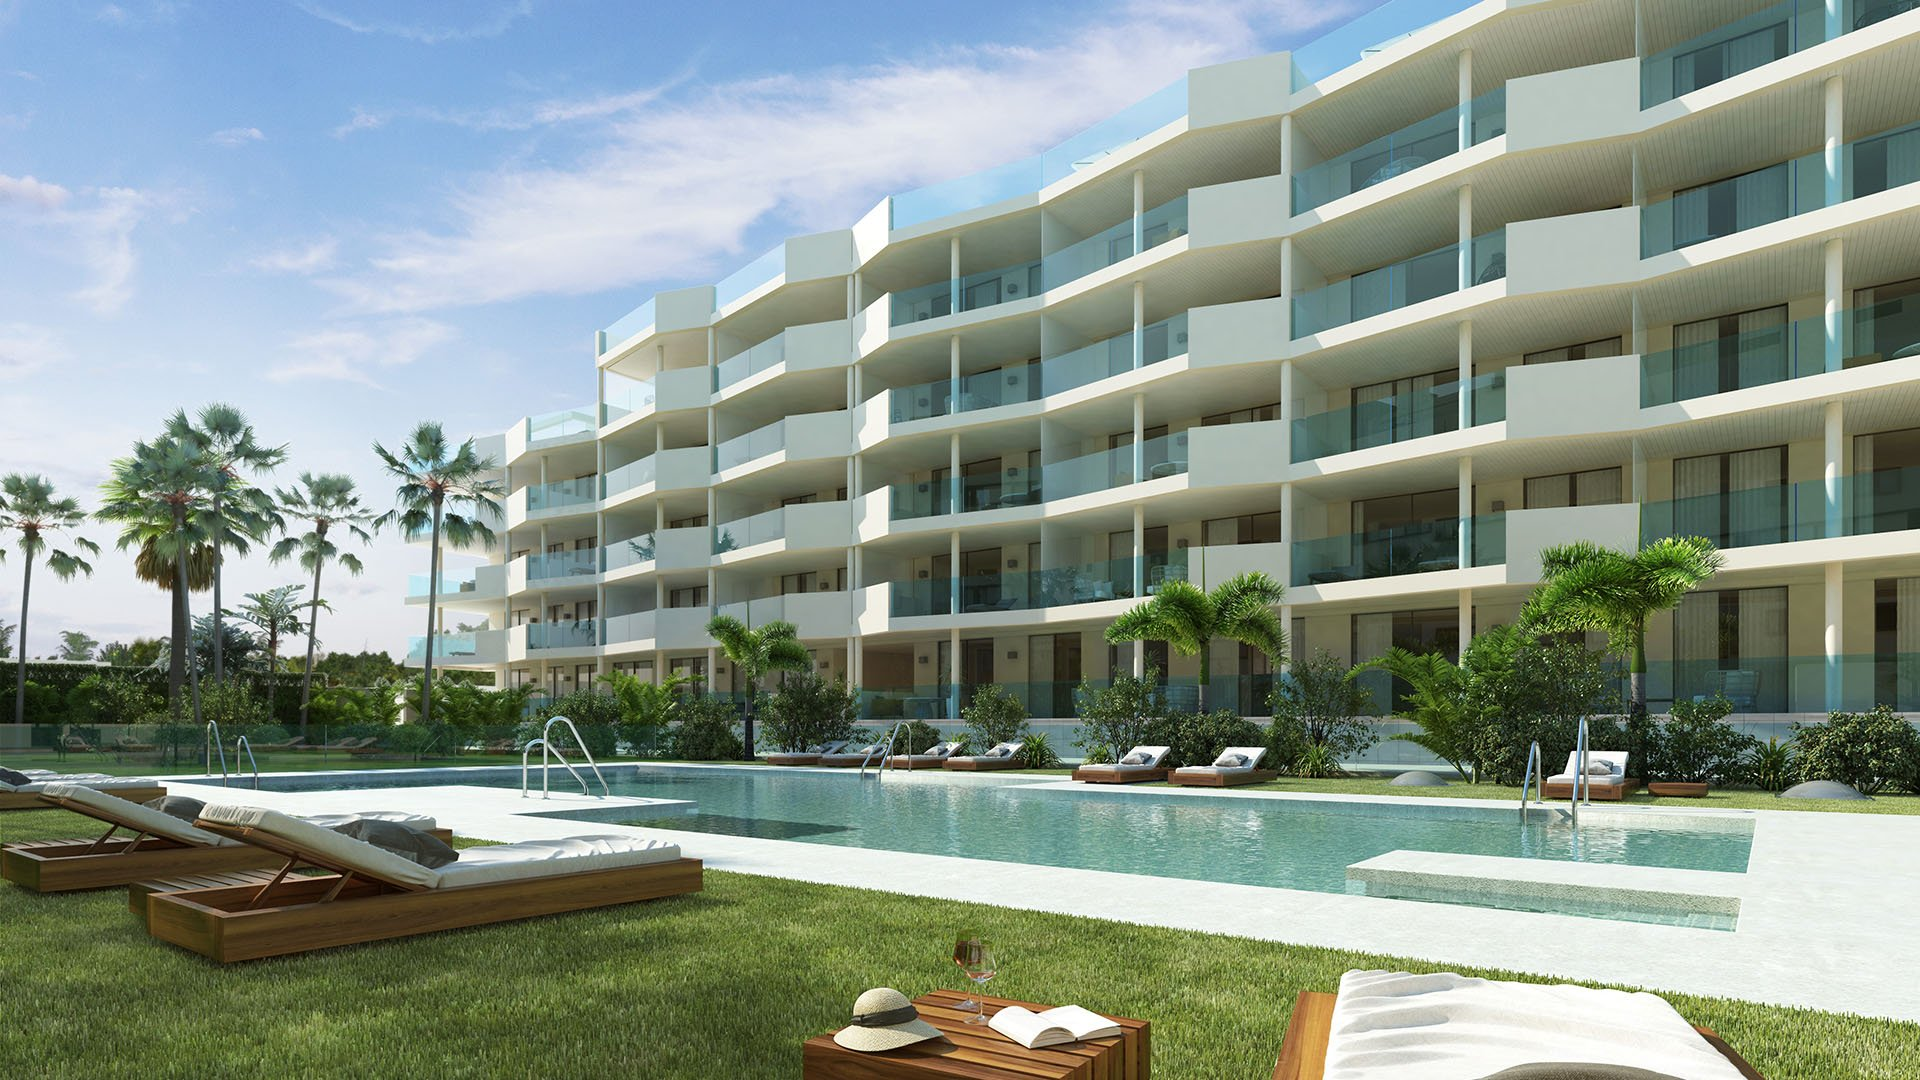 Jardines de Las Lagunas: Stylish apartments in an extraordinary location